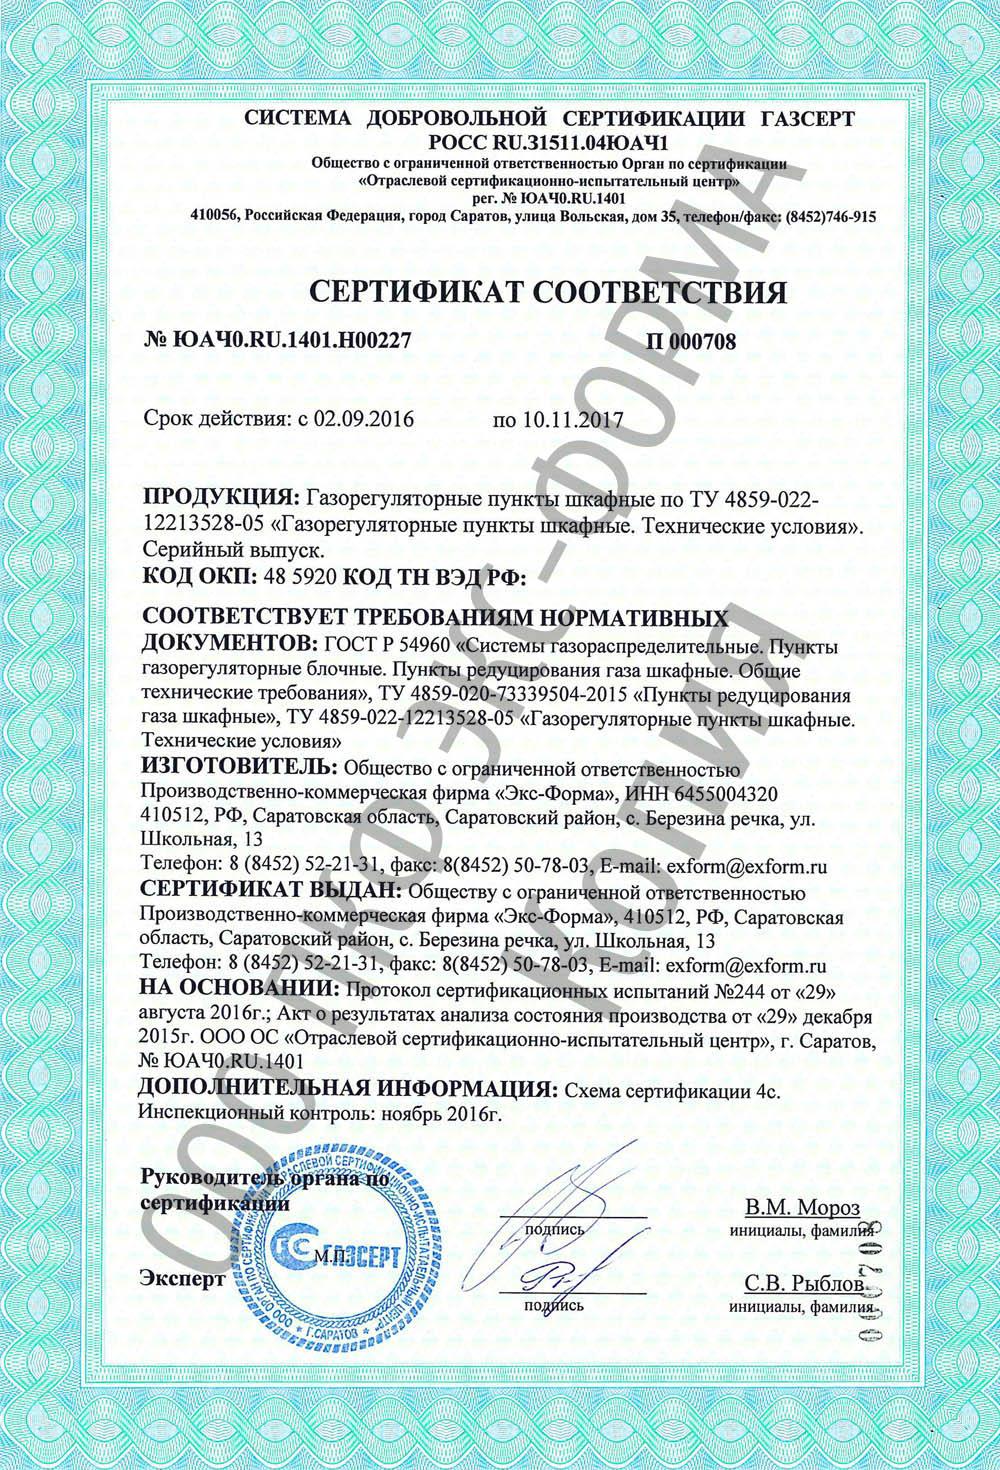 Сертификаты Газсерт на шкафные газорегуляторные пункты